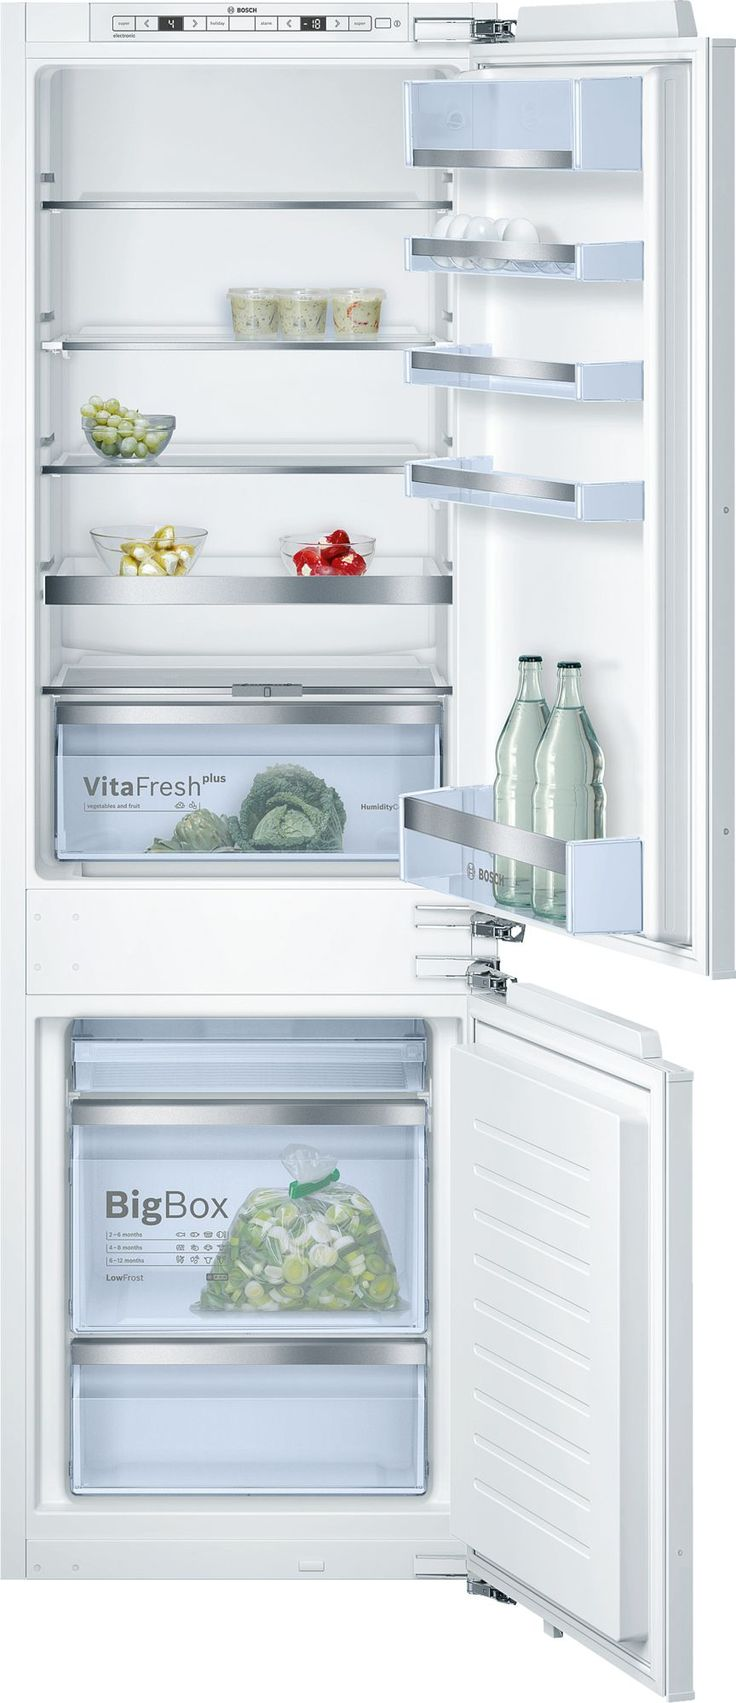 11 best integrated fridge images on Pinterest | Integrated fridge ...